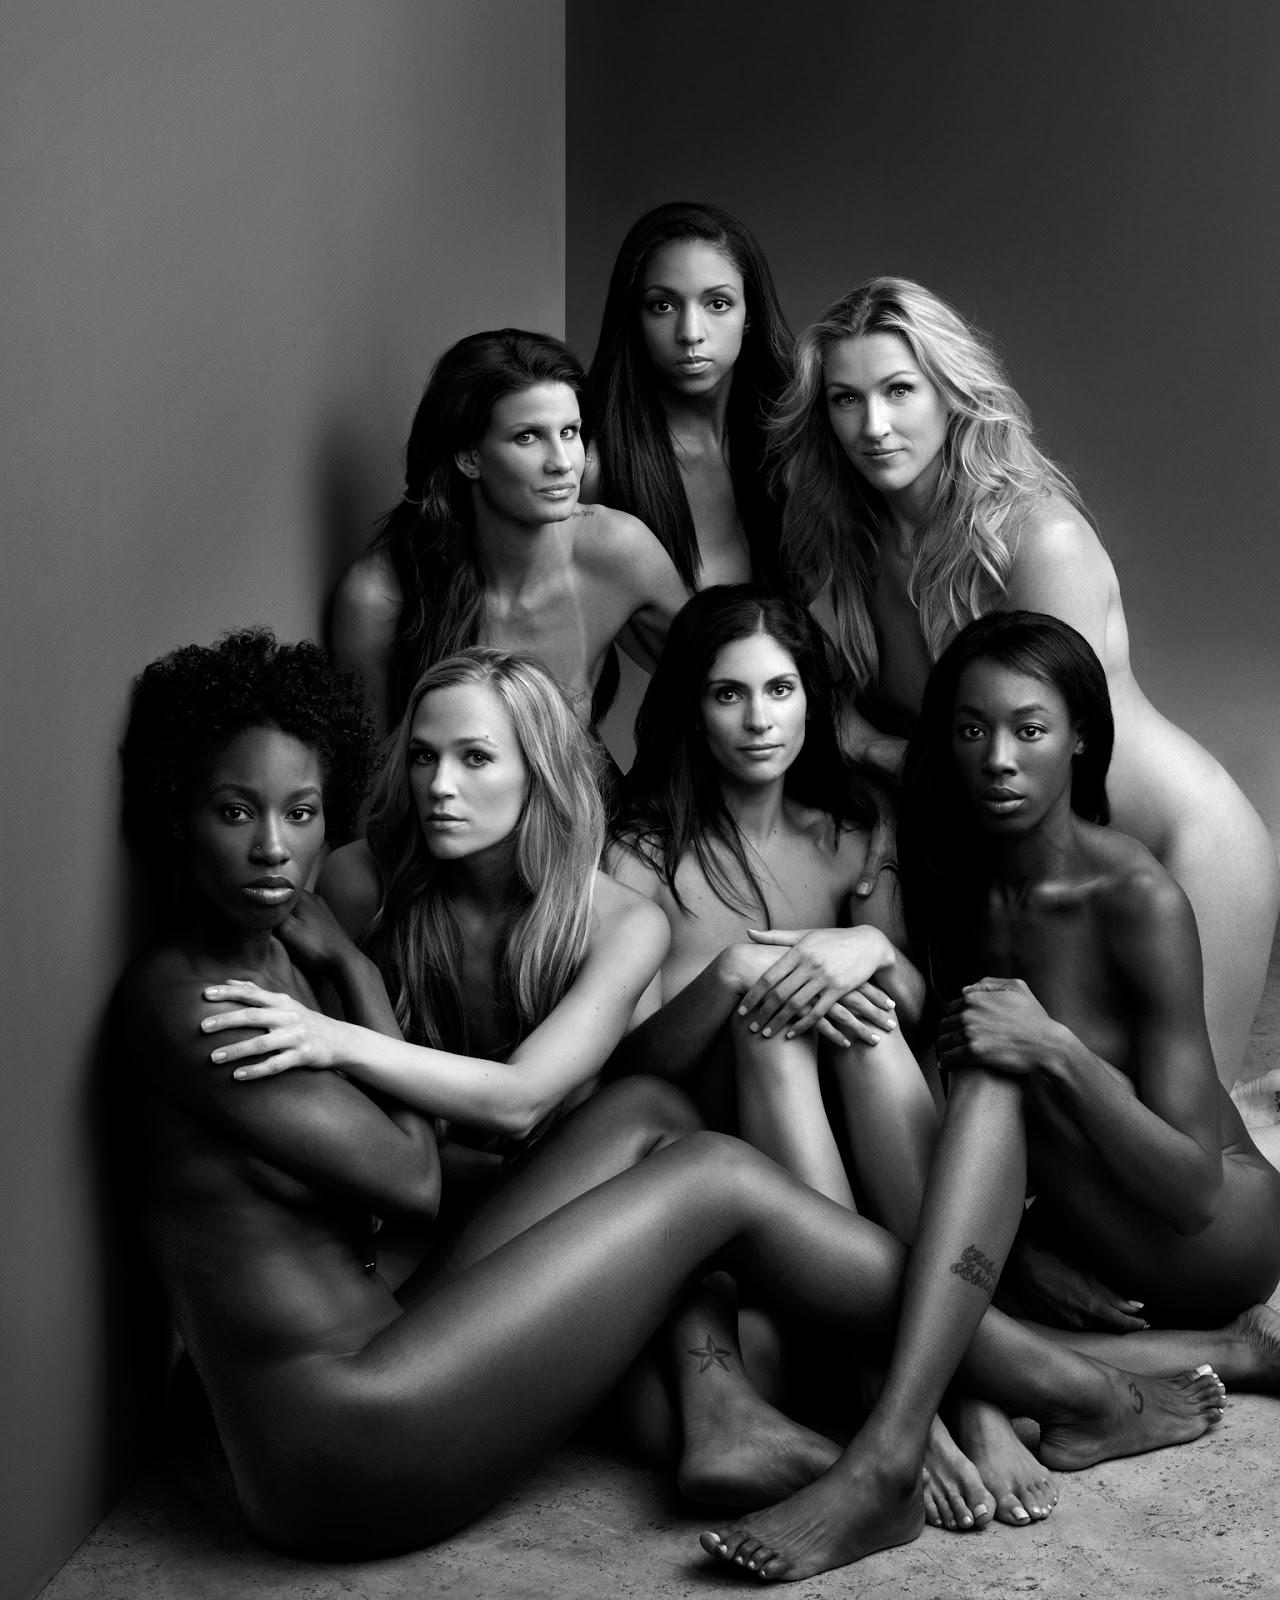 ESPN Body Issue 2012: Power Ranking Hottest Female Pics